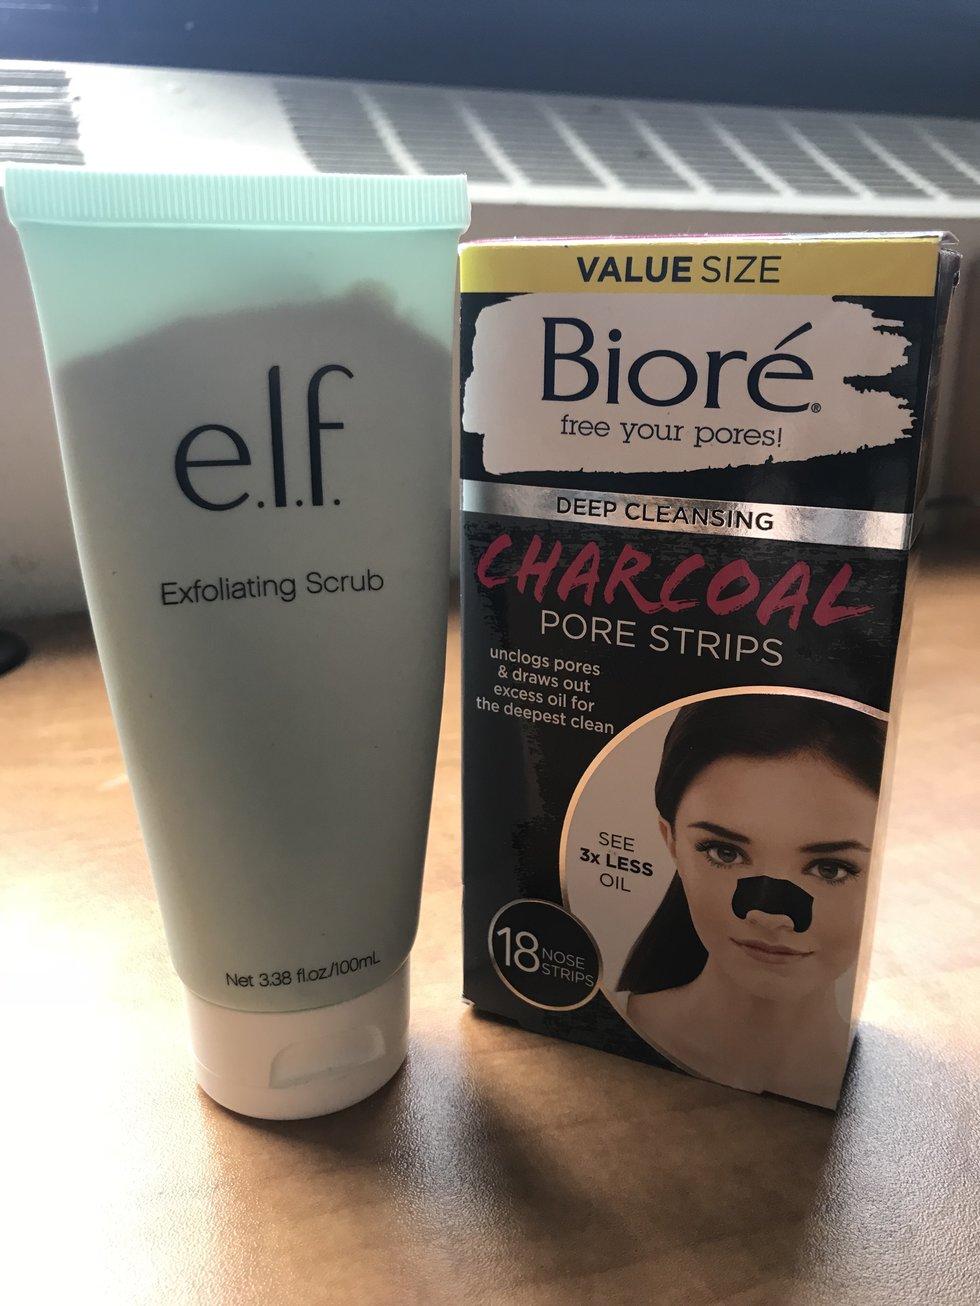 7 Ways To Perfect Your Skin Care Routine Biore Bubble Bundle Bright Exfoliation Elf Exfoliating Scrub Charcoal Pore Strip